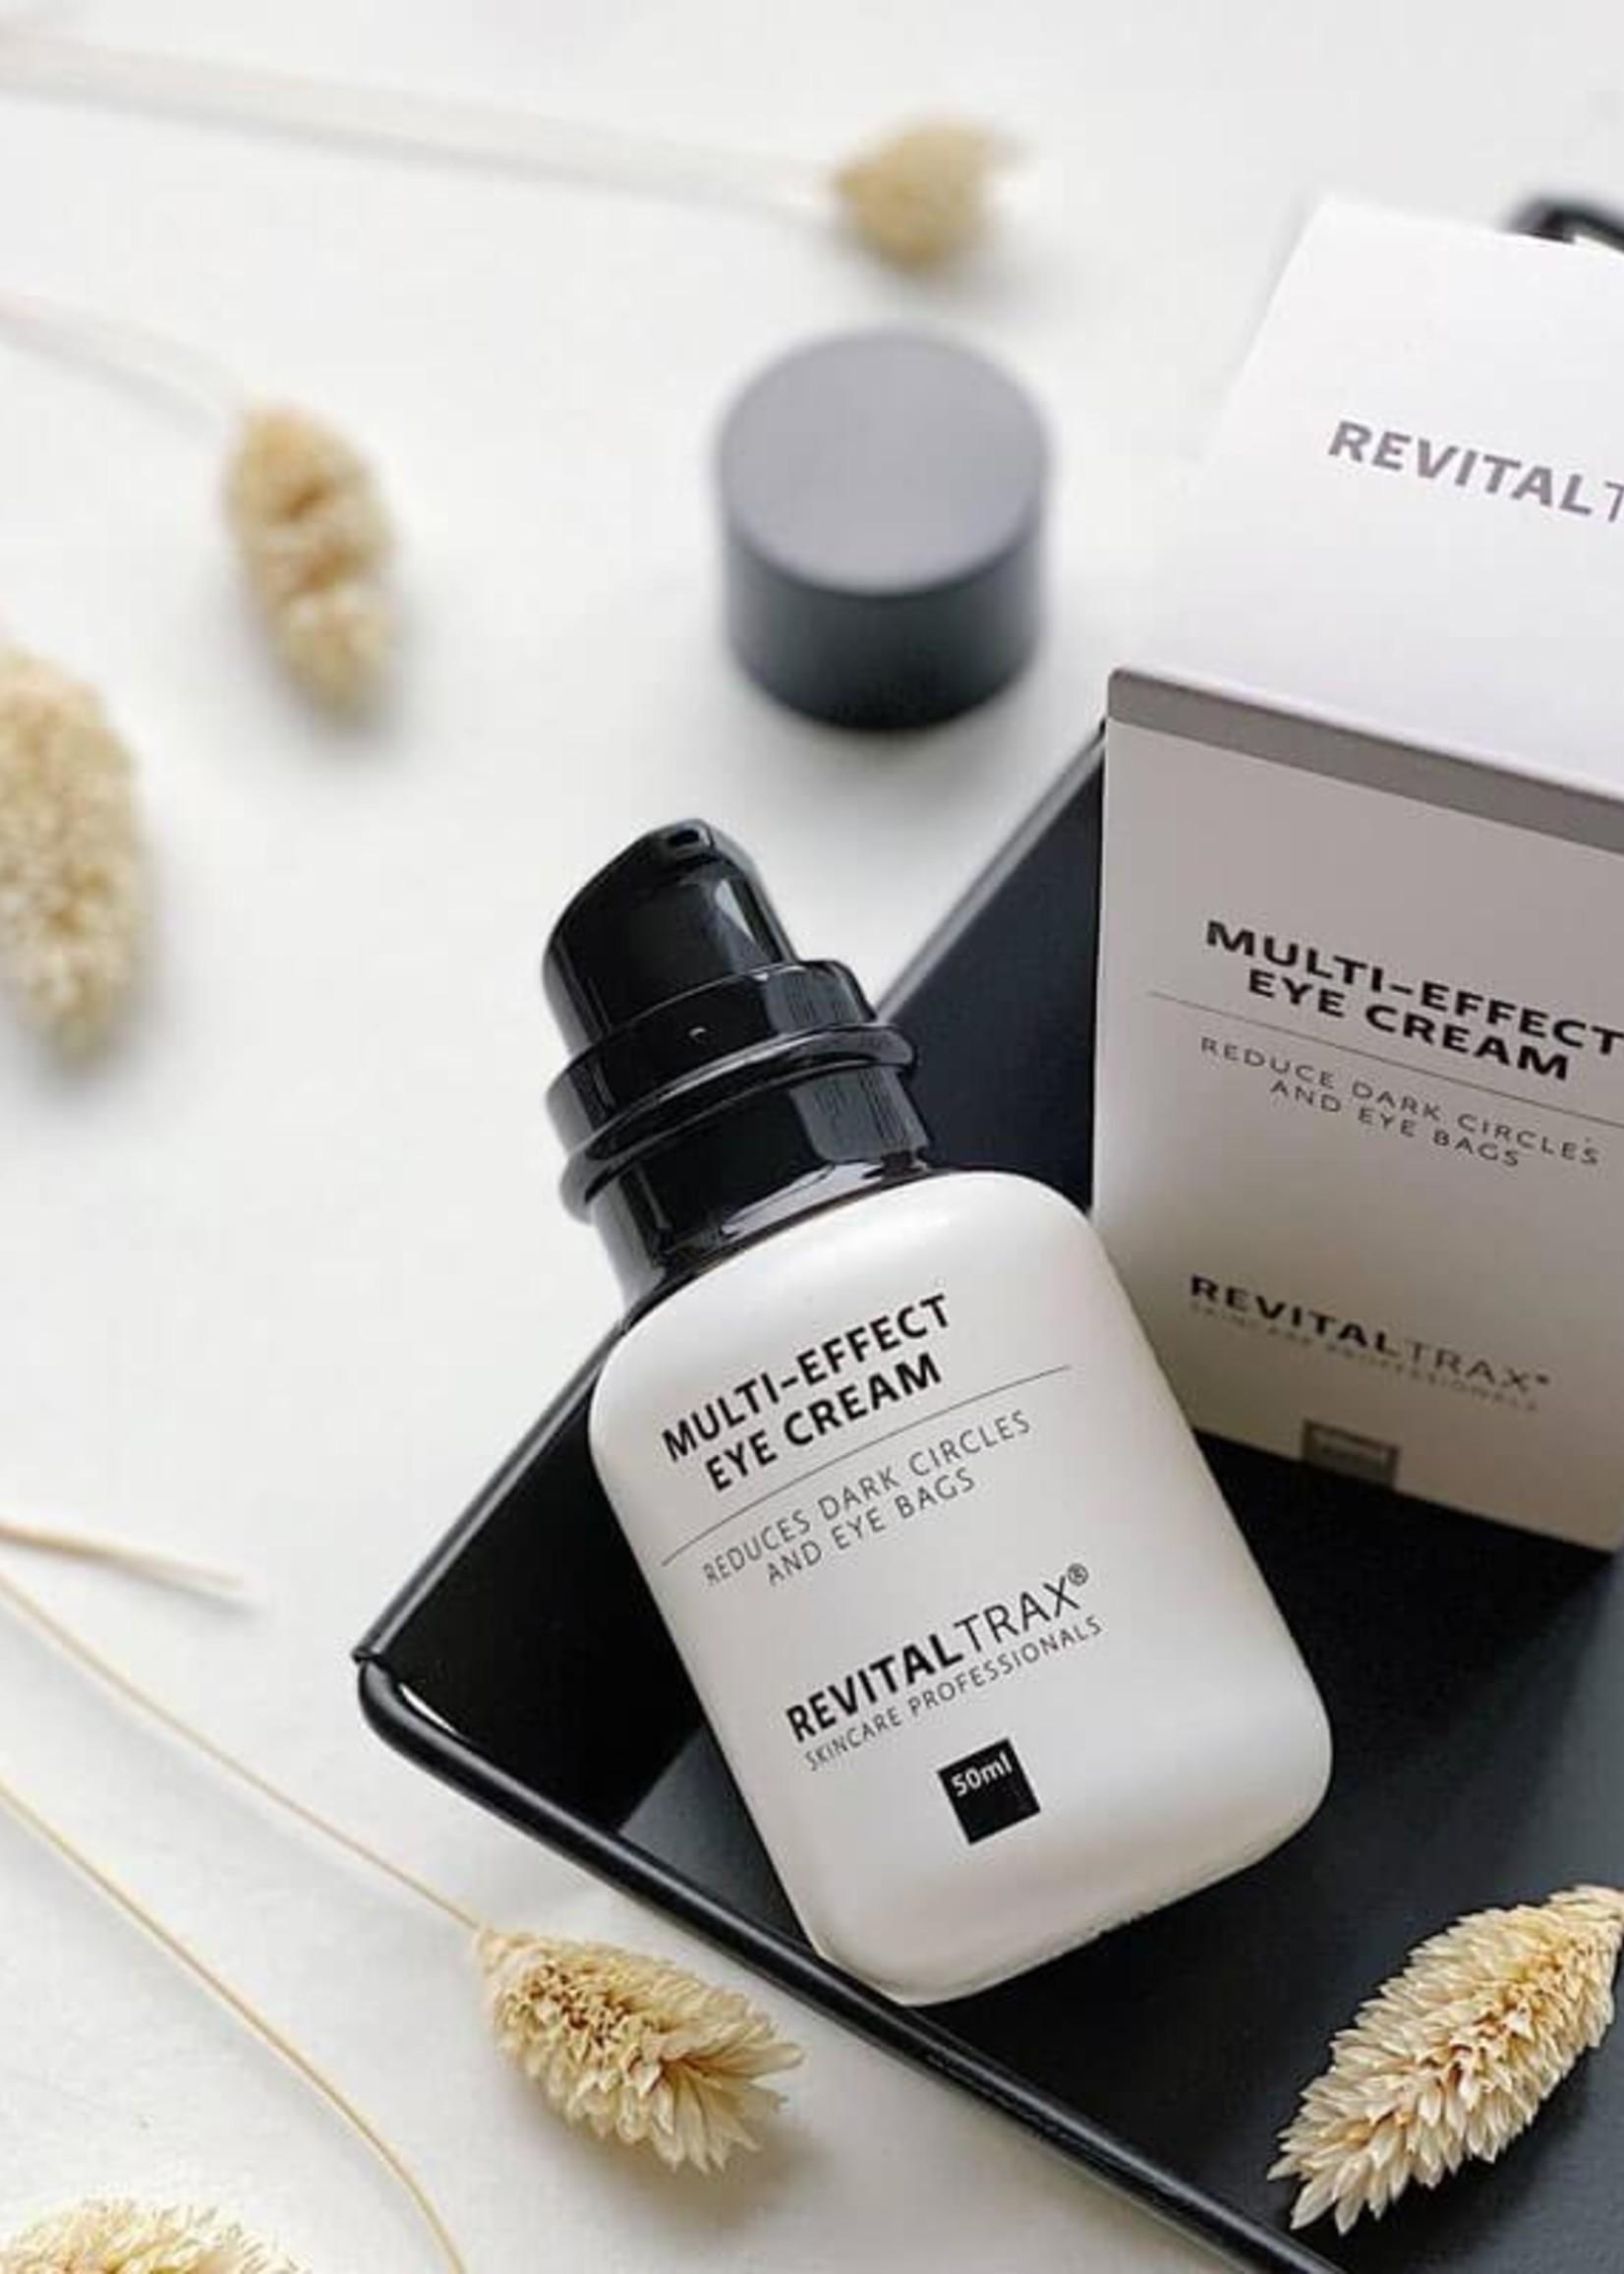 Revitaltrax Revitaltrax Multi-effect Eye Cream